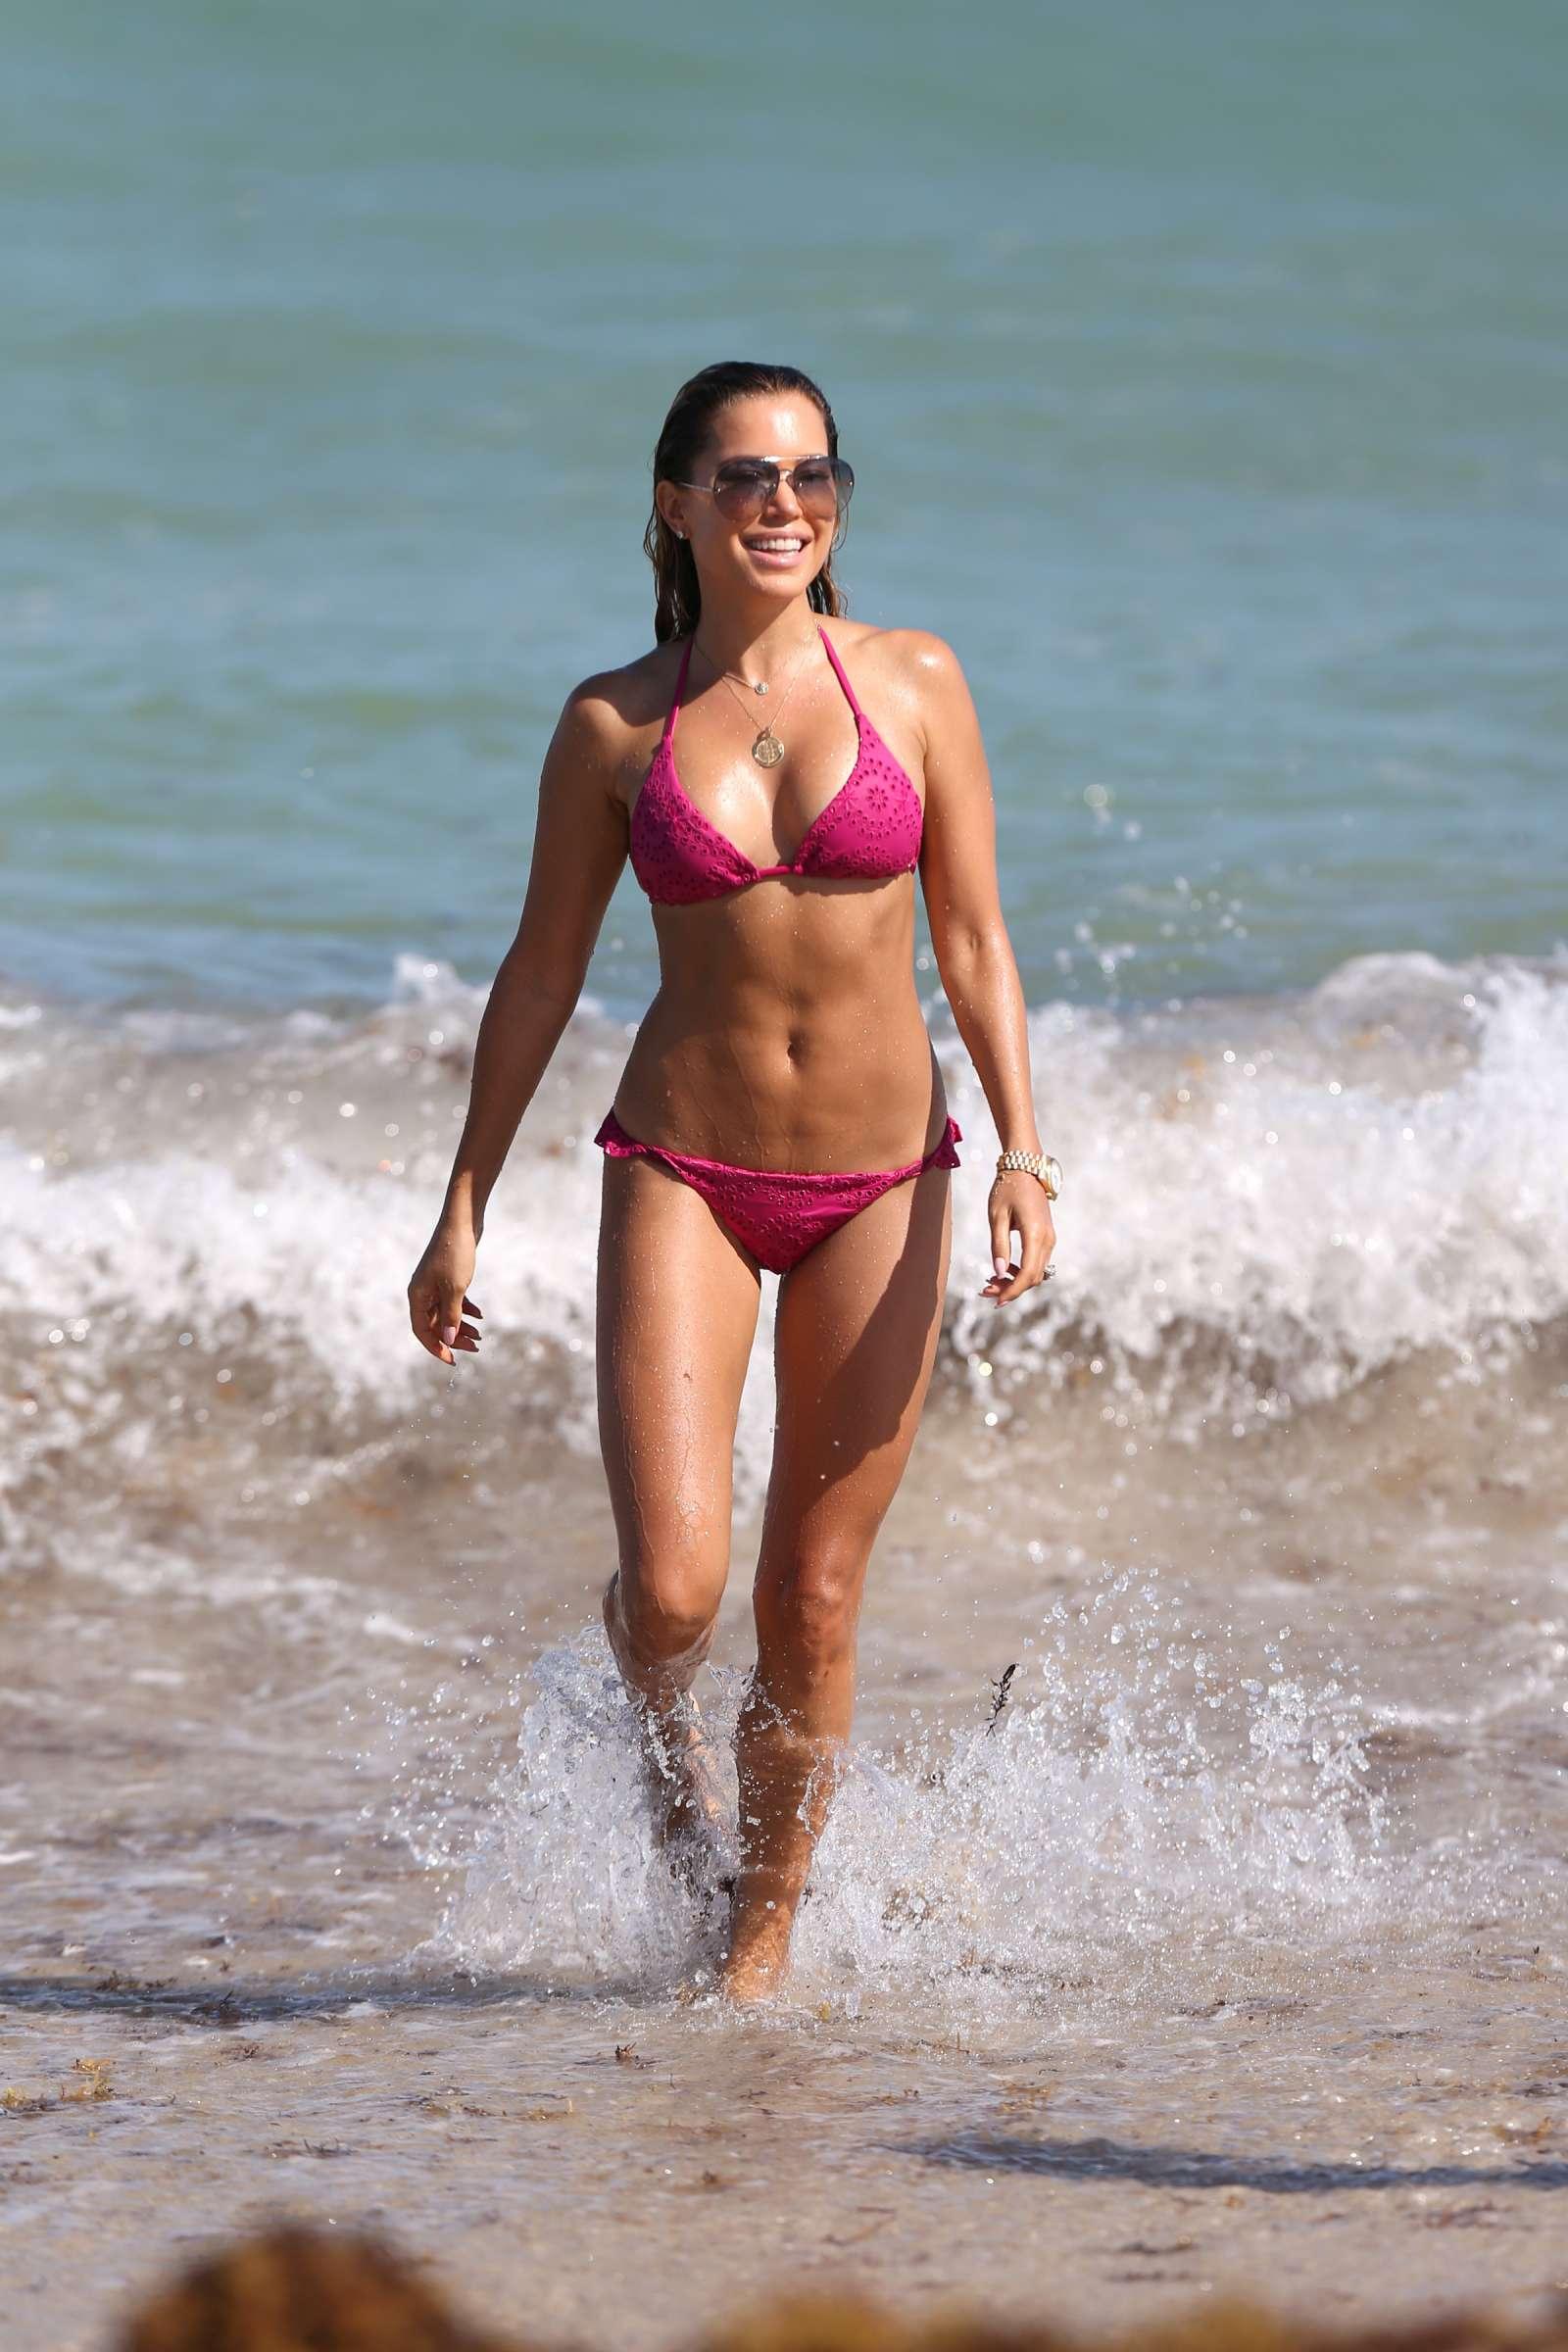 Sylvie Meis 2018 : Sylvie Meis in Pink Bikini 2018 -04